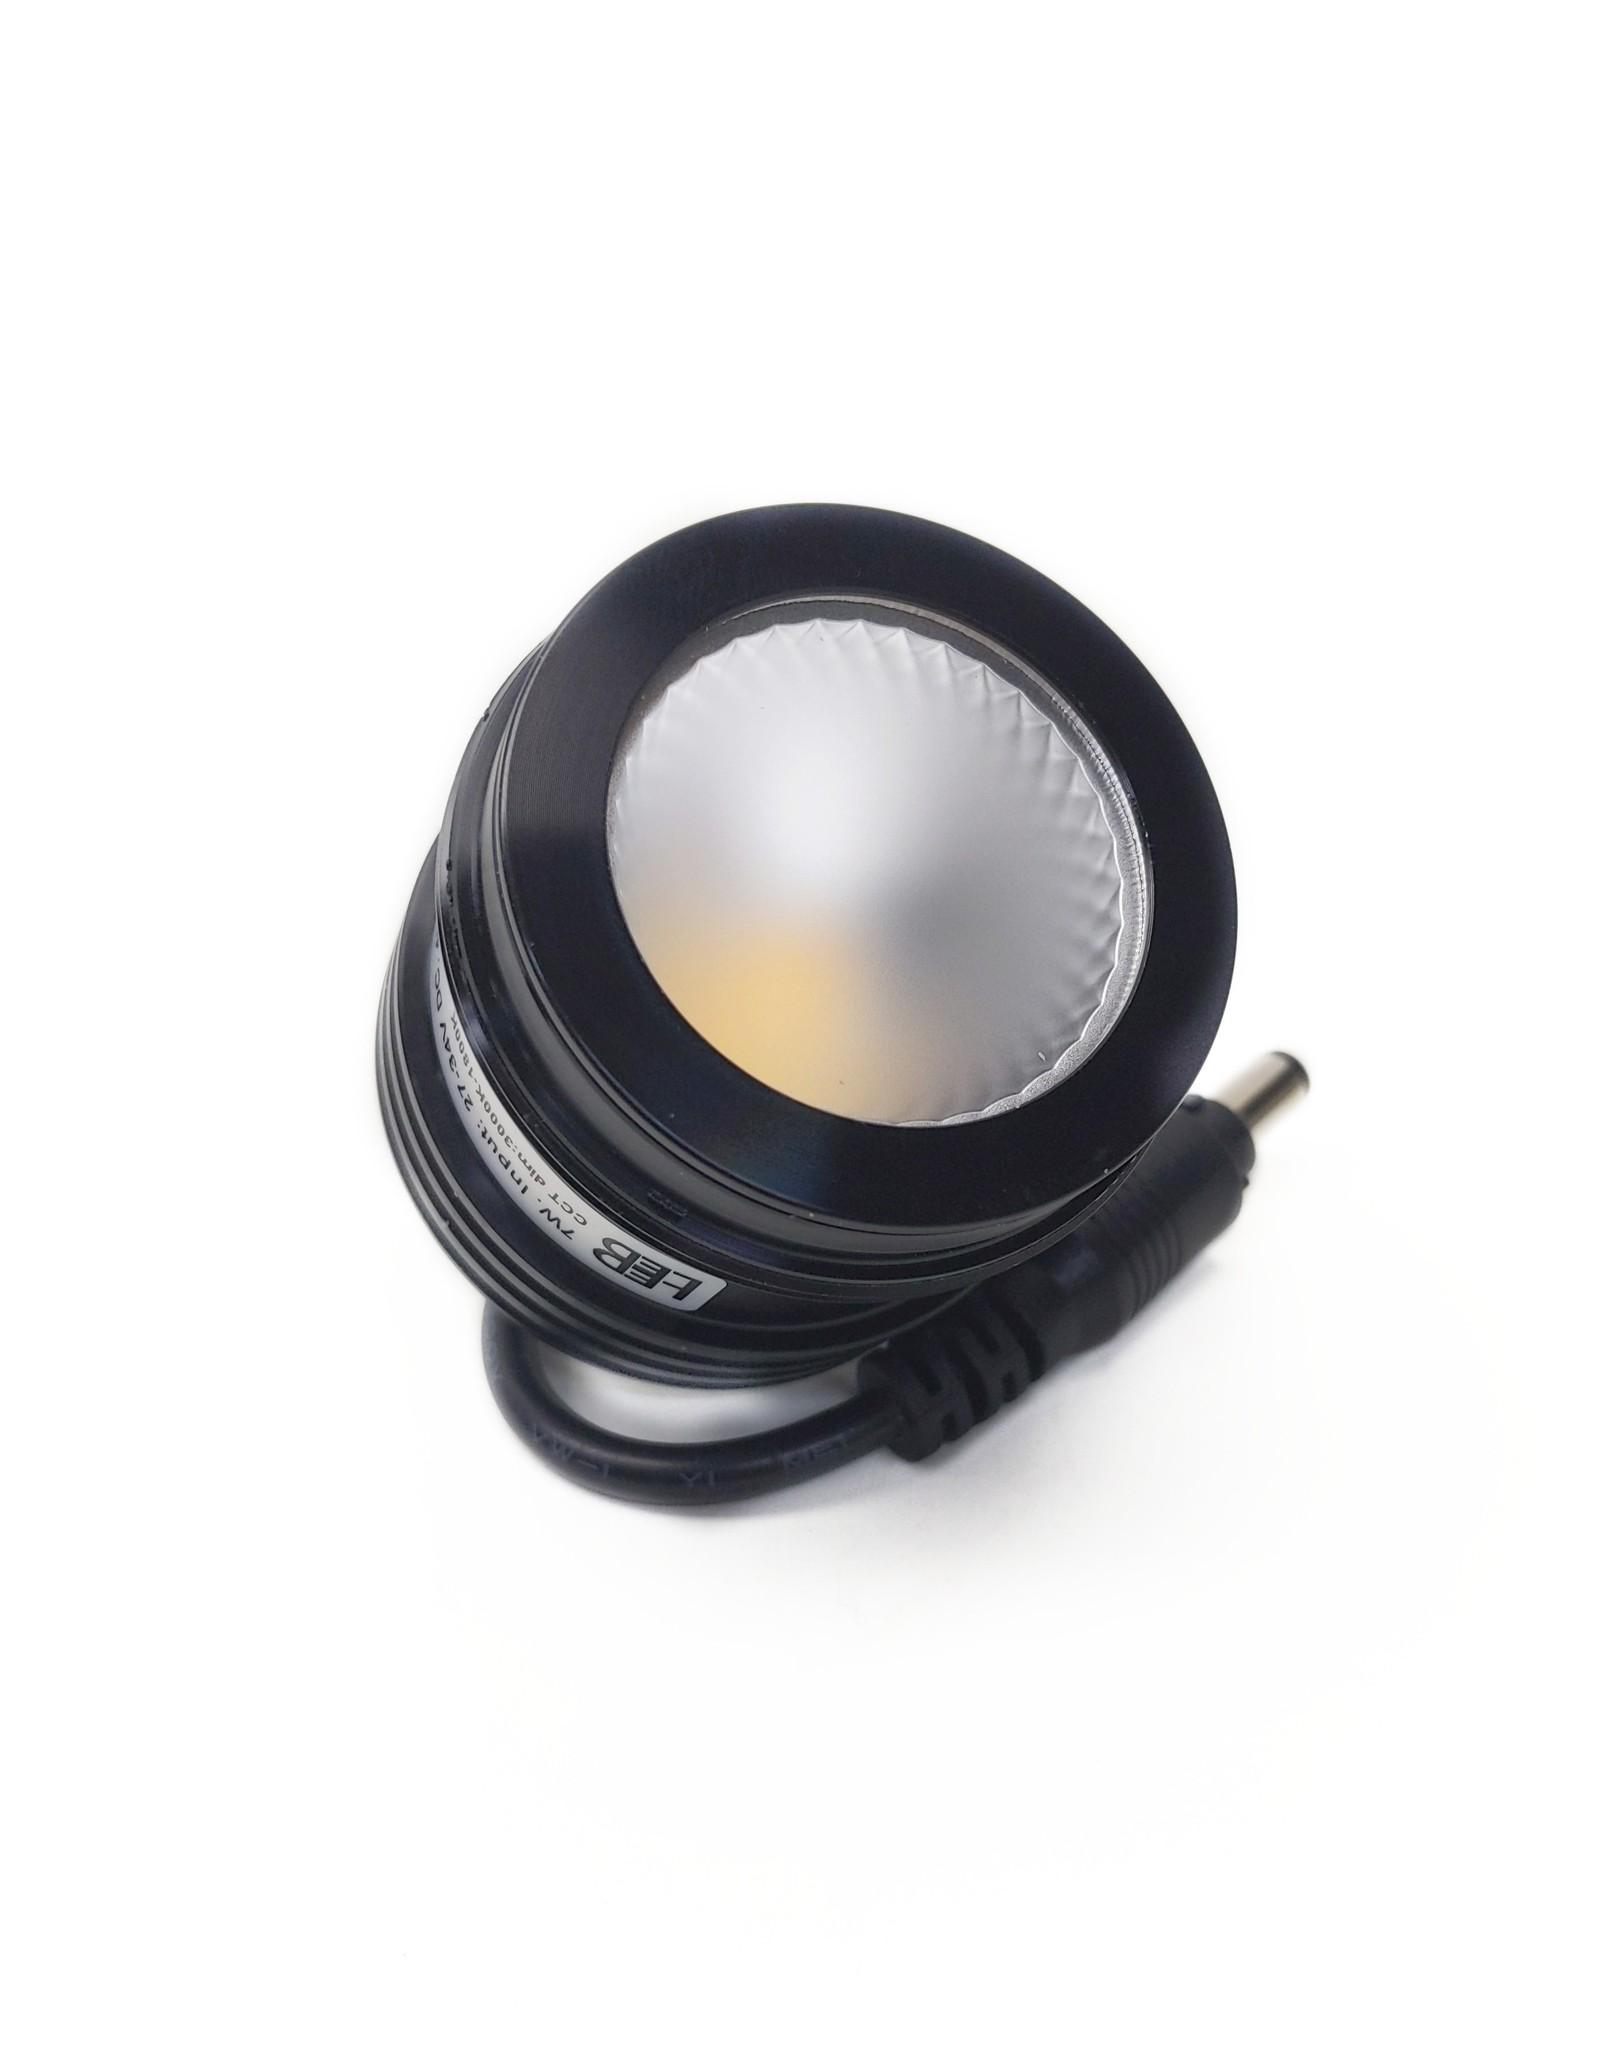 LedLed ADDY led kantelspot vierkant wit dimbaar - Pro reflector